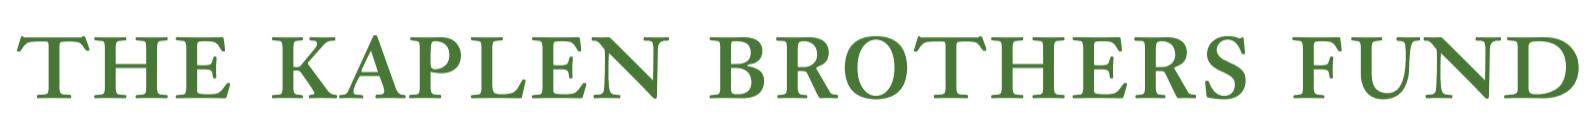 The Kaplen Brothers Fund logo